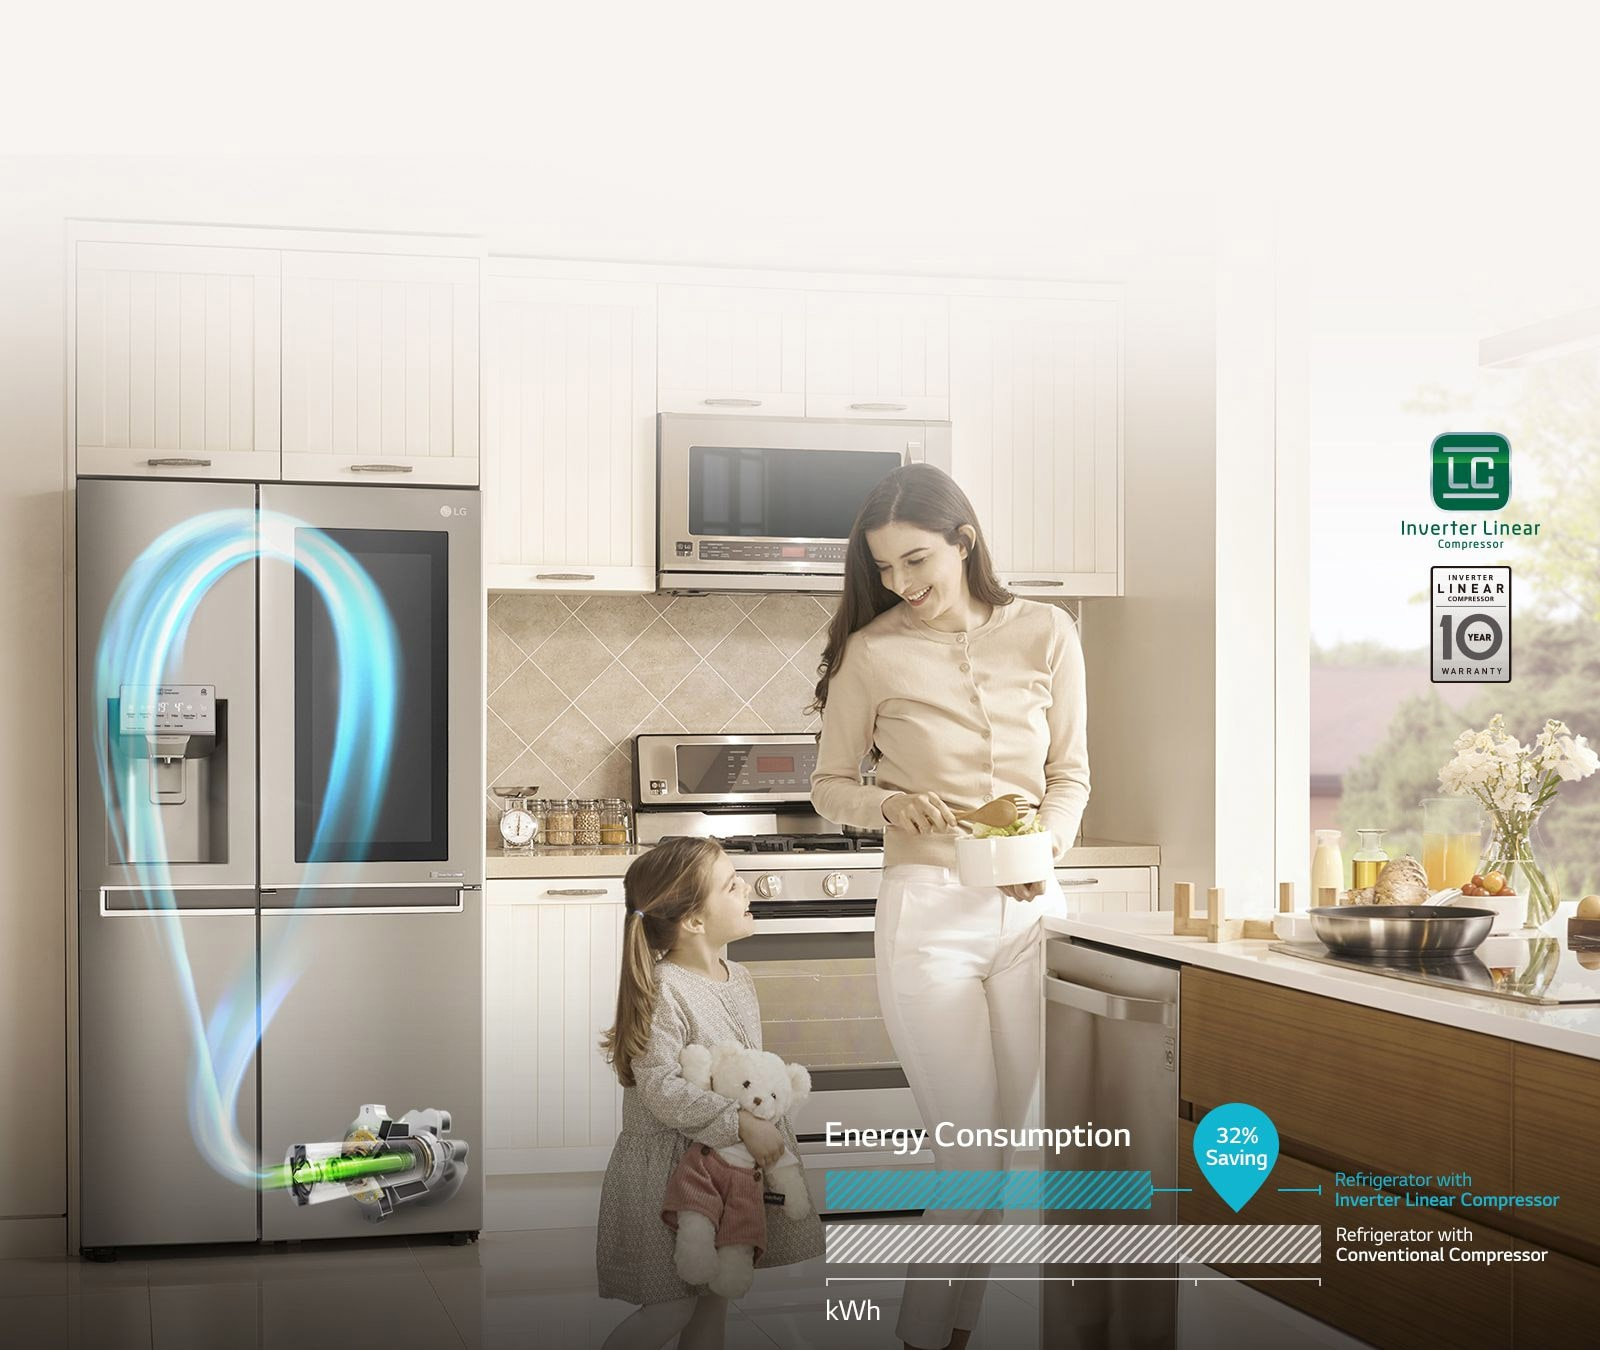 LG Fridges - Energy Saving with Inverter Linear Compressor